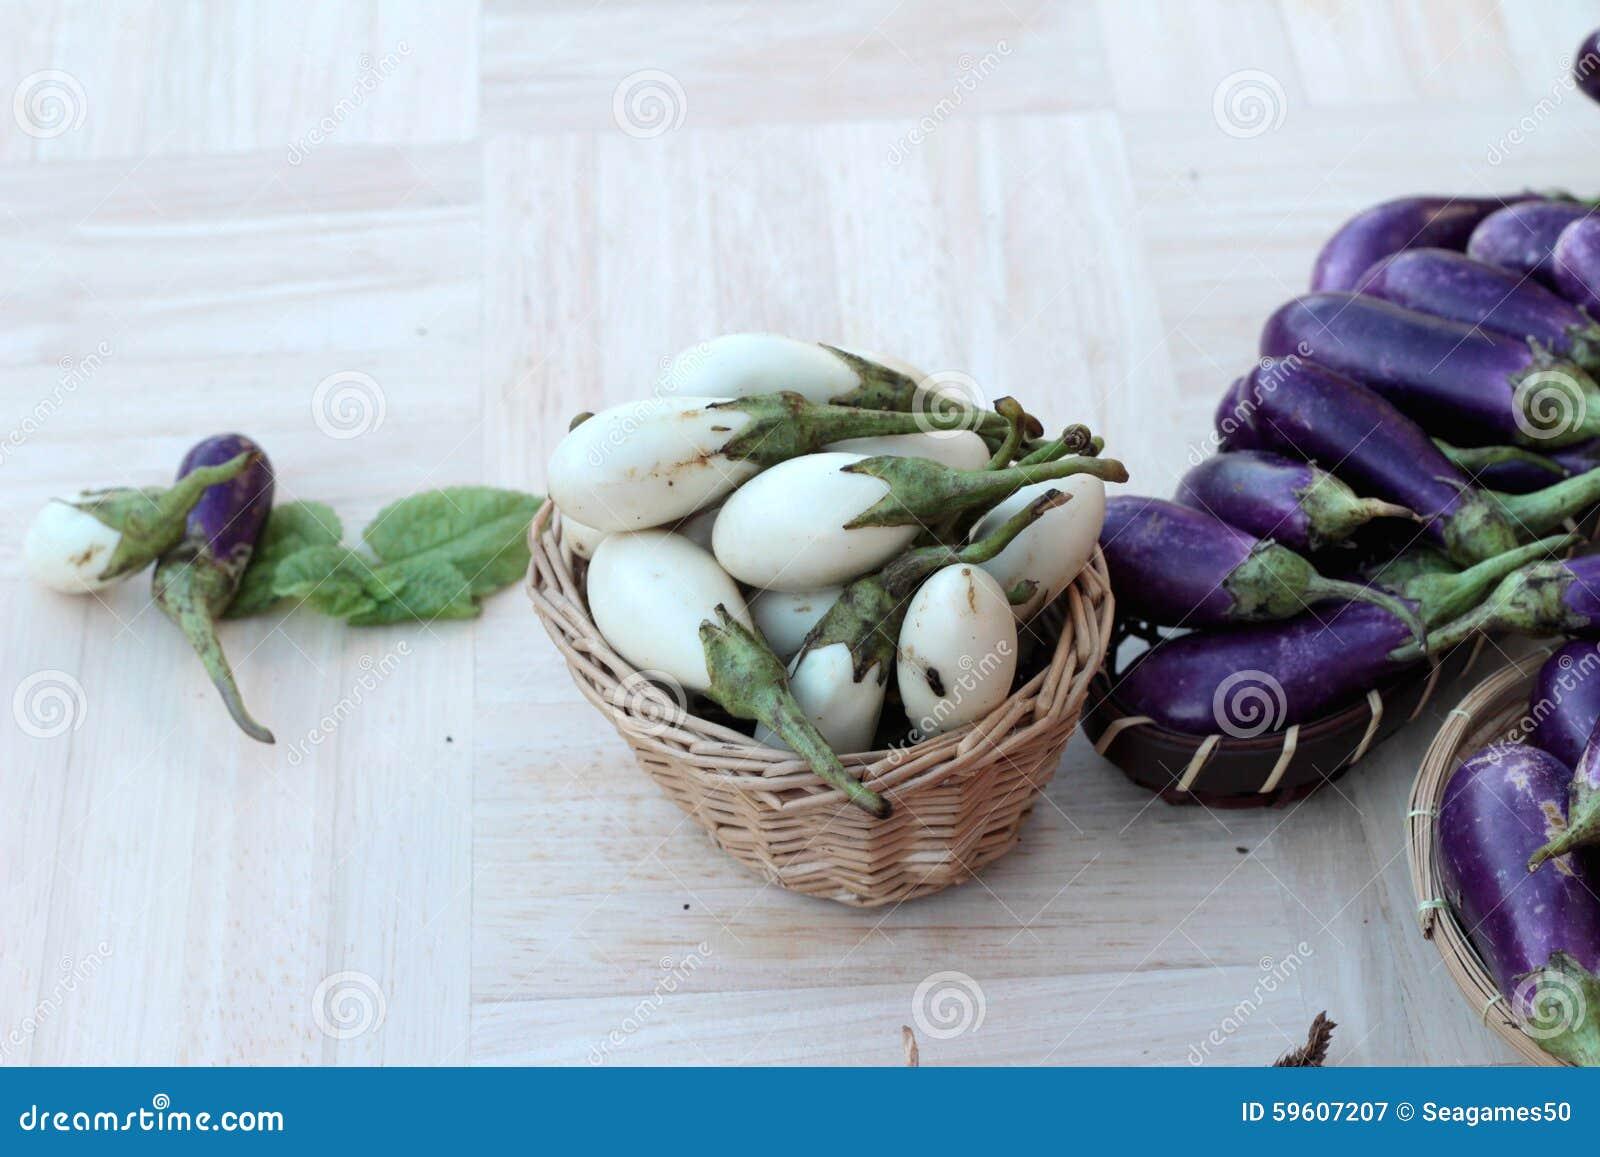 Melanzana Fresca Porpora E Bianca Per Cucinare Fotografia Stock ...